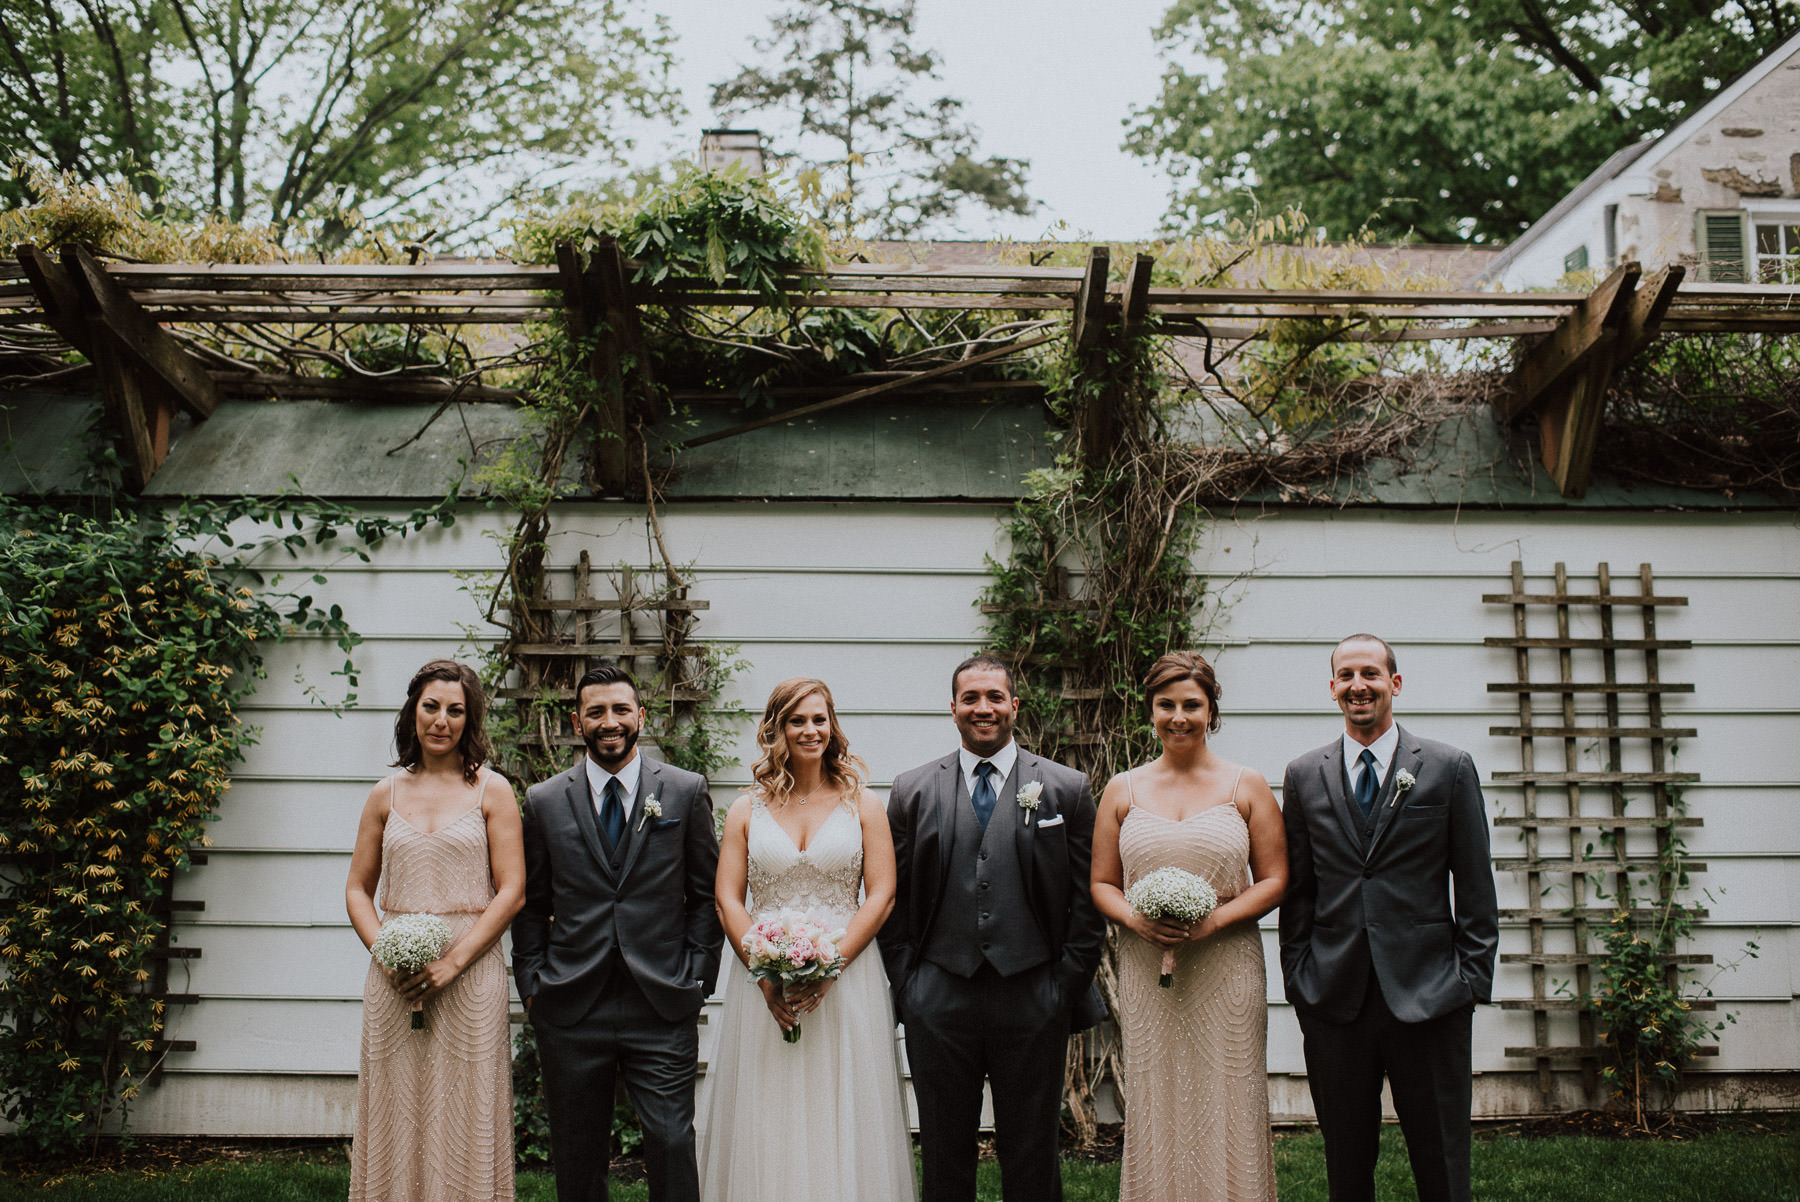 appleford-estate-wedding-photography-40.jpg